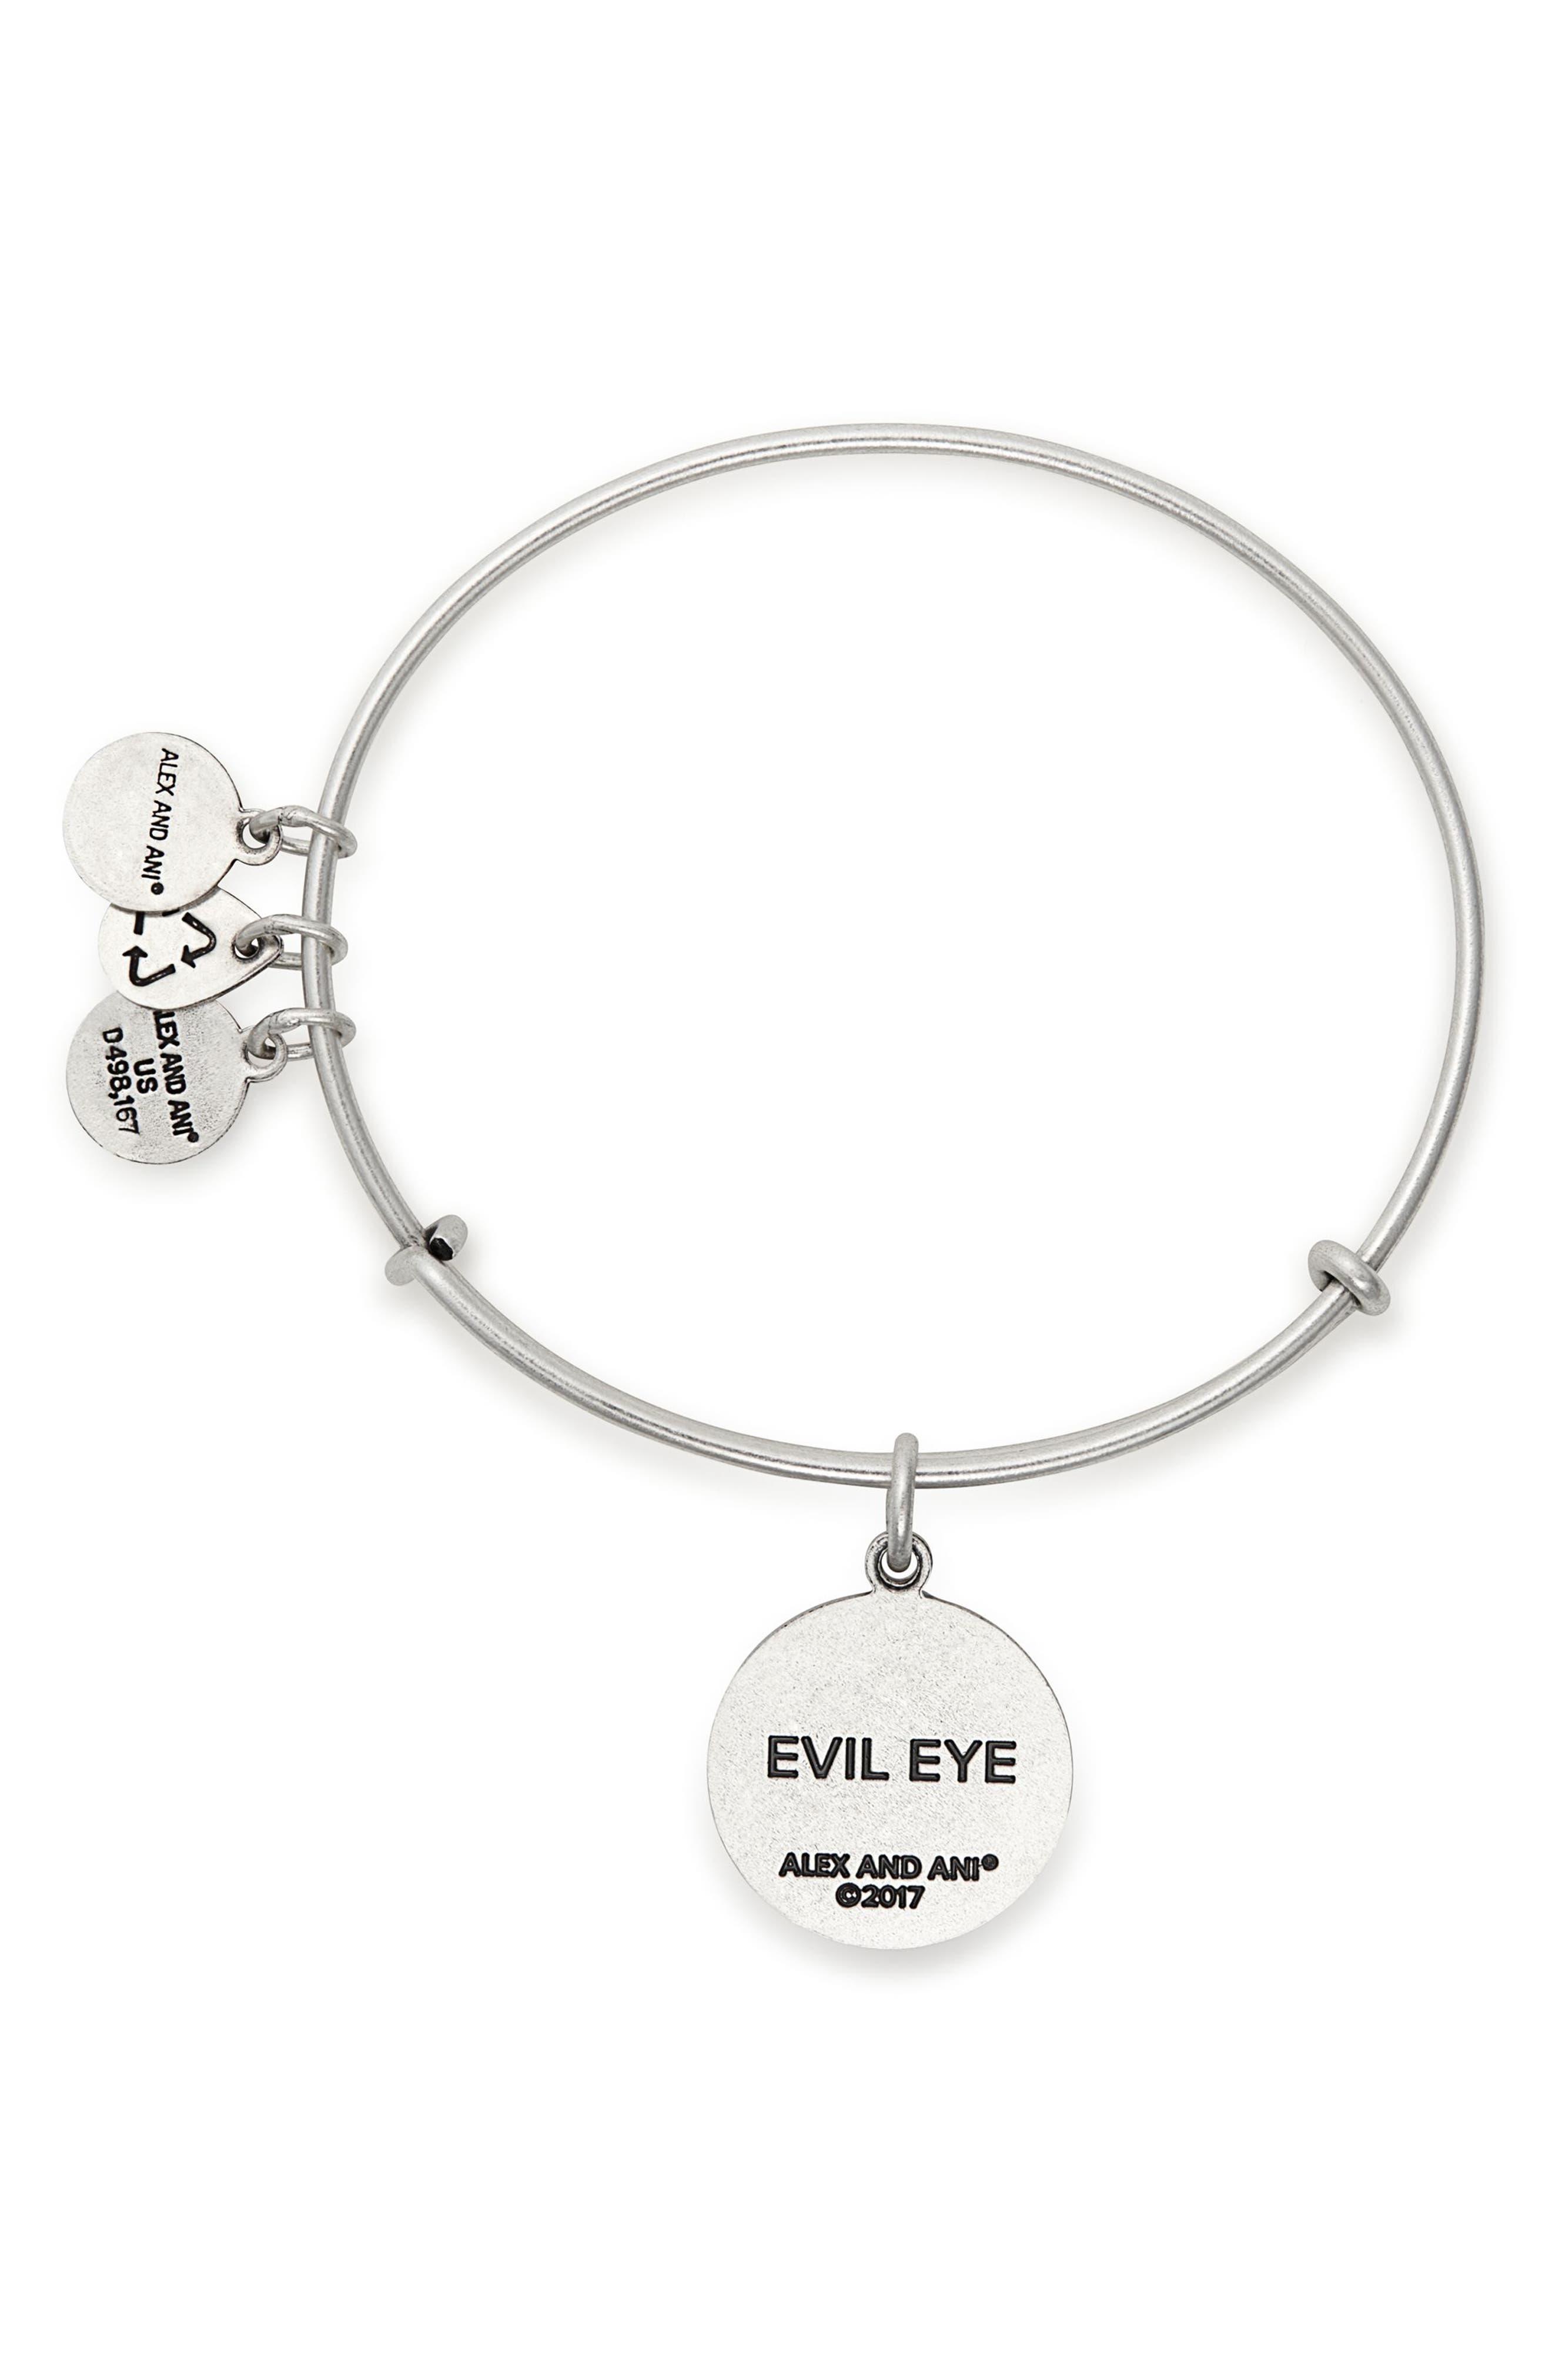 Evil Eye Adjustable Wire Bangle,                             Alternate thumbnail 2, color,                             040